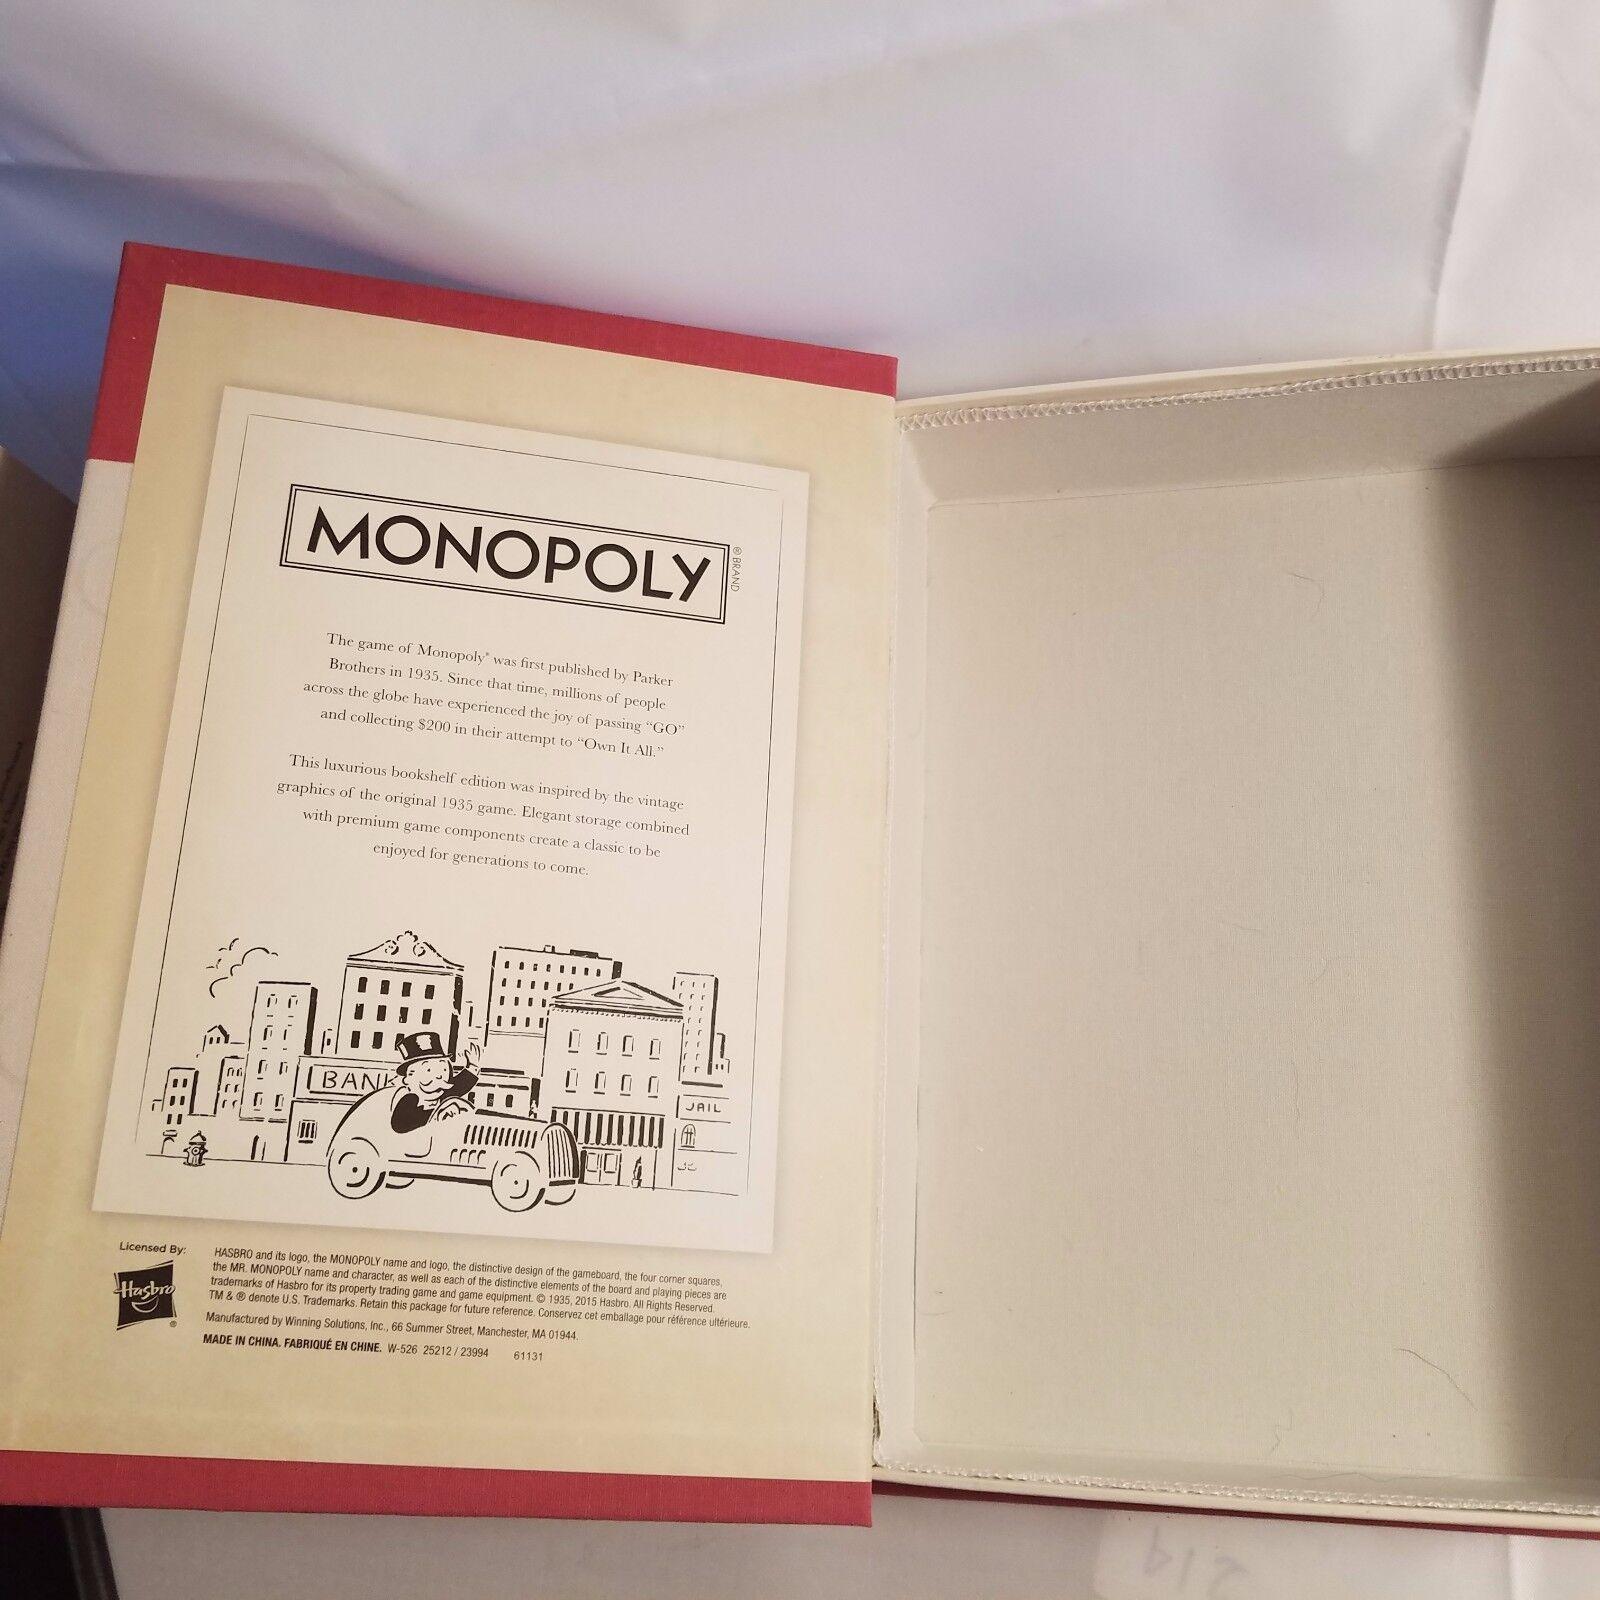 Monopoly Vintage Book Edition Collector Item RARE